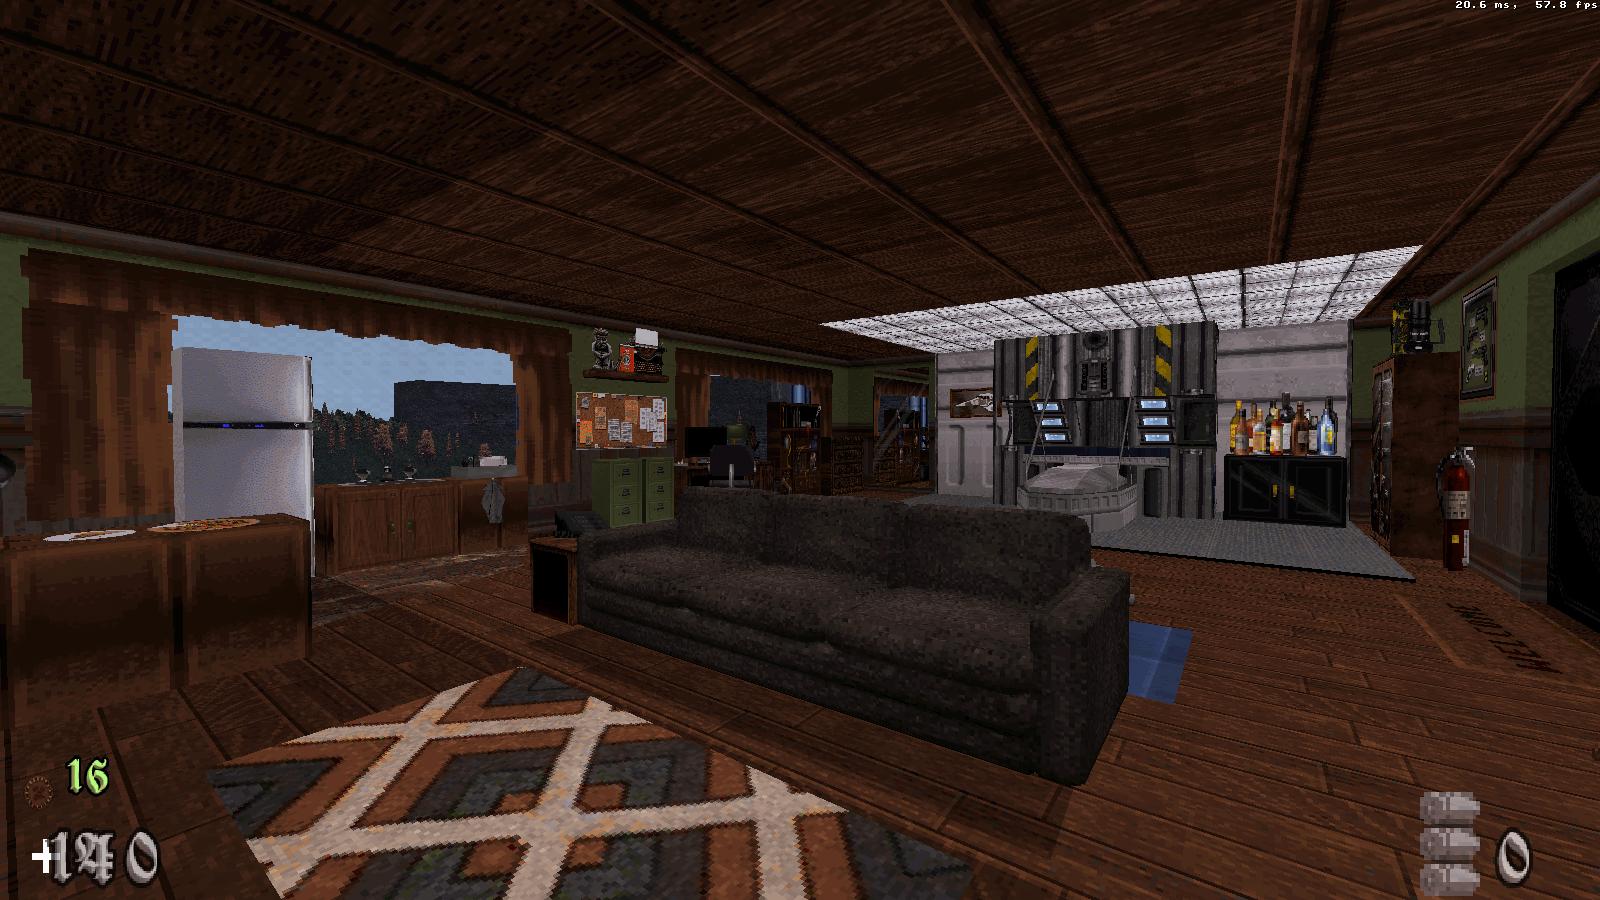 AMC Rusty's room, by Alicatgamer